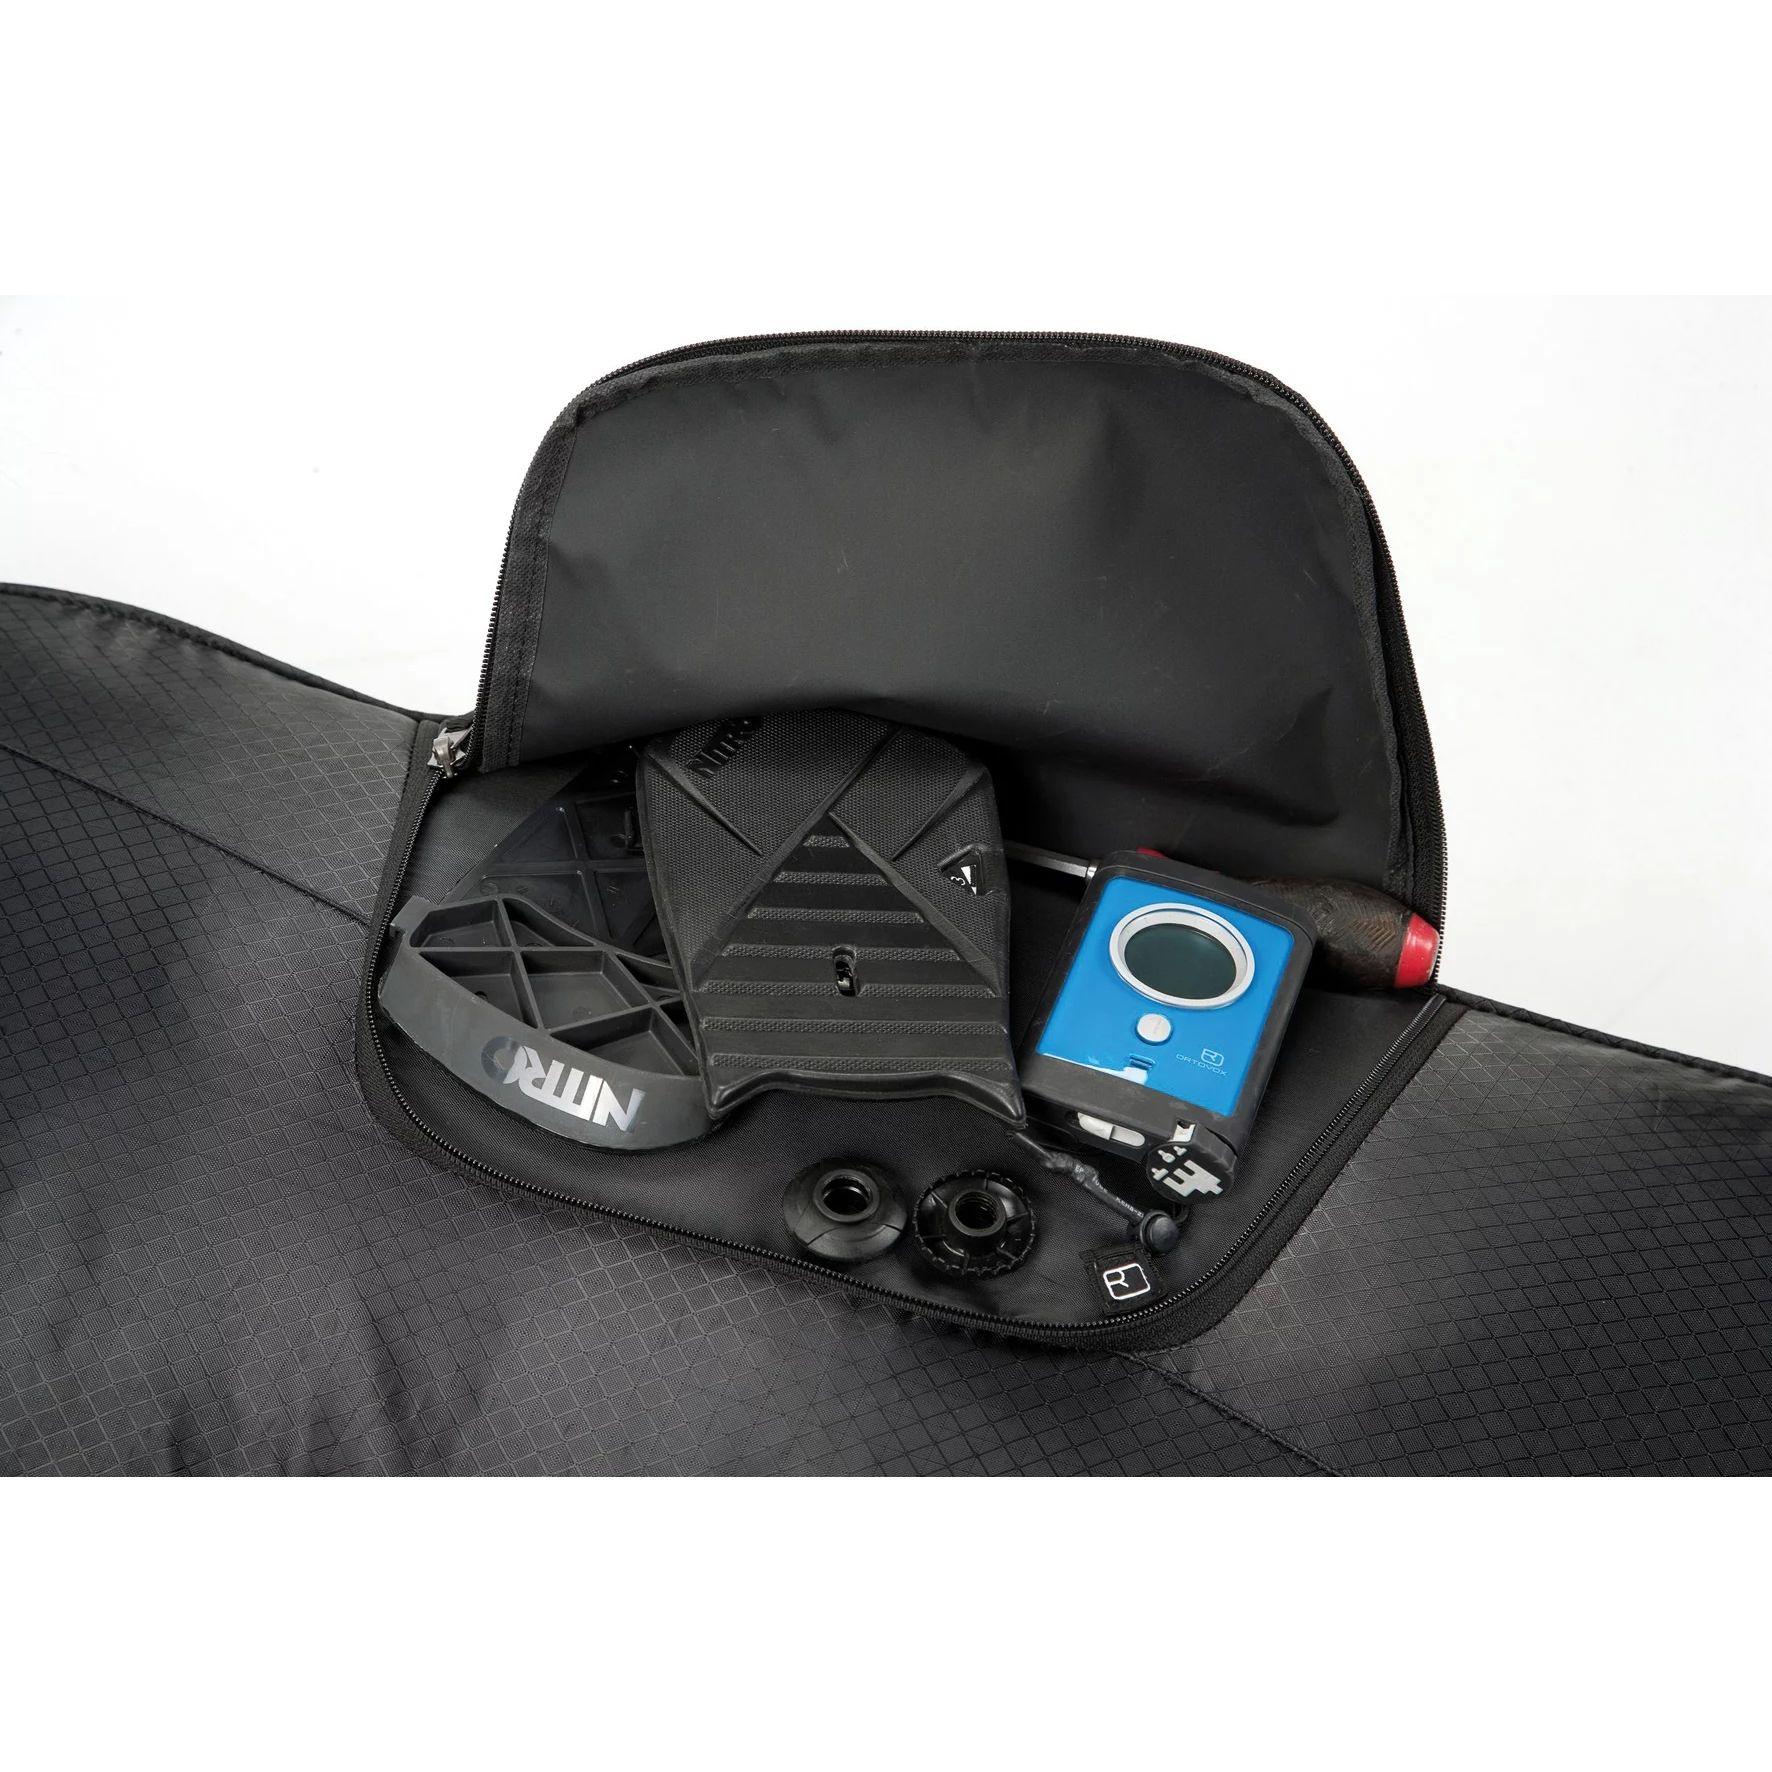 NITRO Snowboard Boardbag Tasche CARGO Boardbag 2021 forged camo Snowboardbag